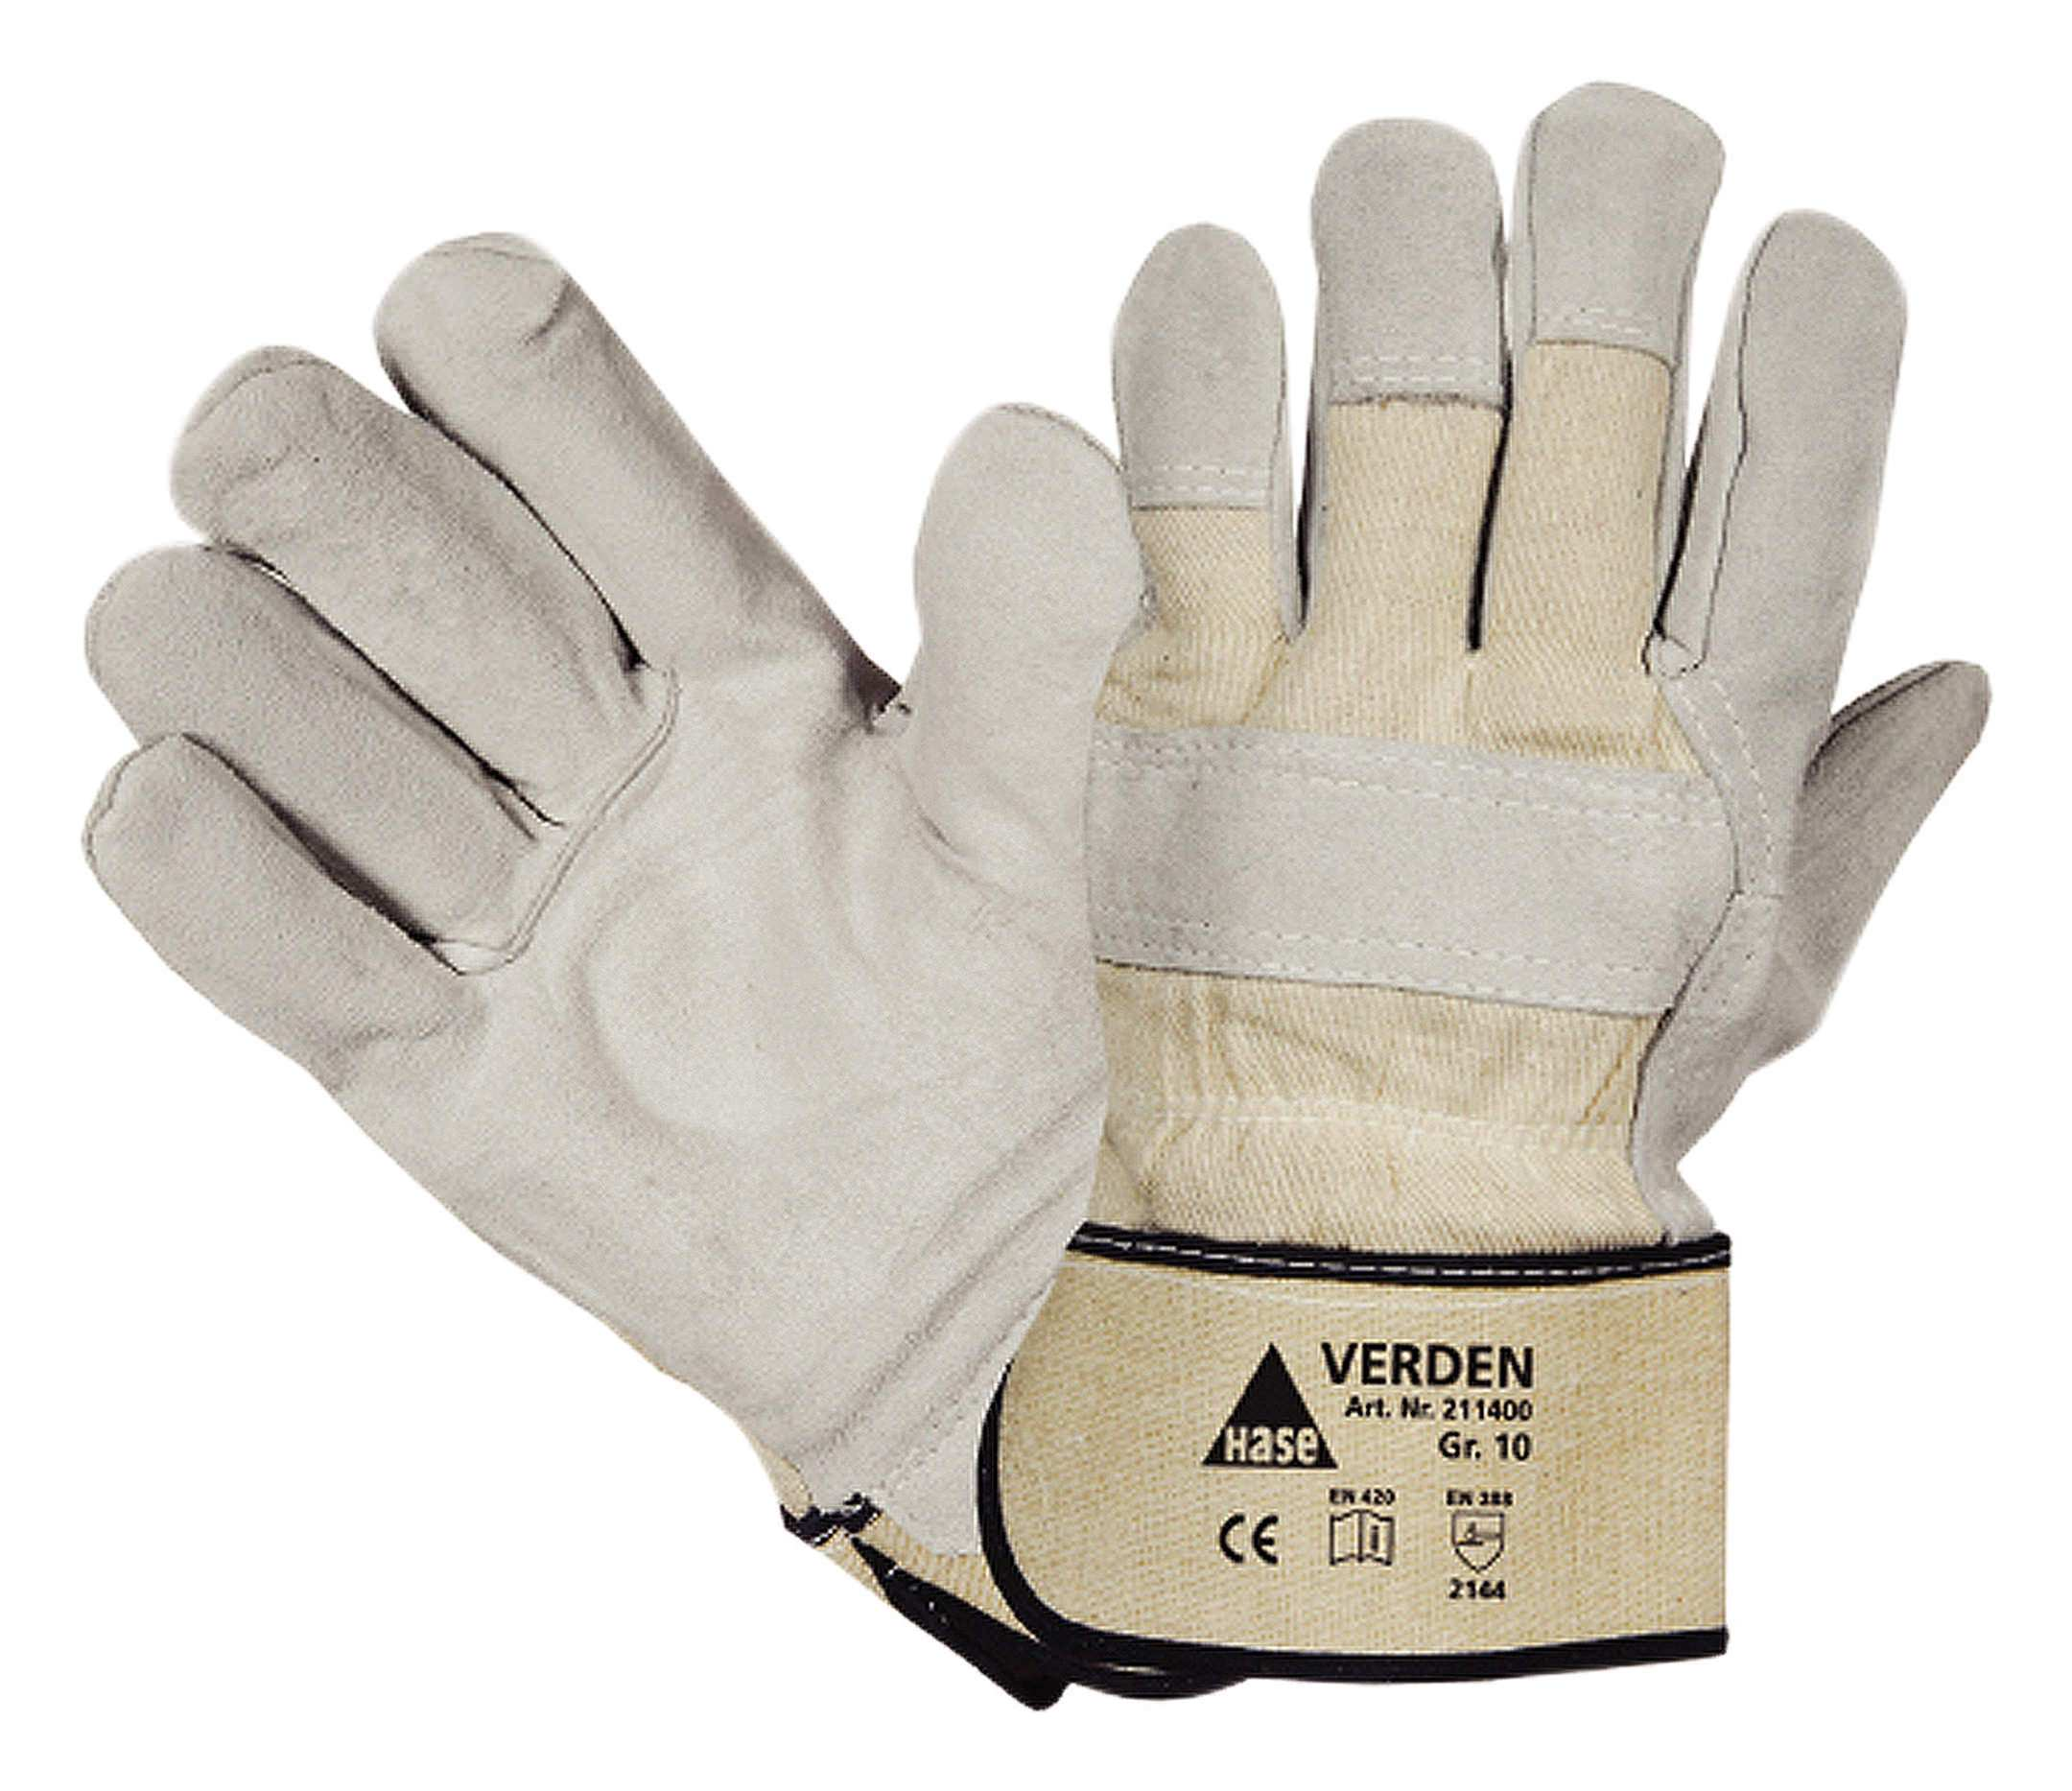 Hase Safety Handschuh Verden Spaltleder Größe 10 grau MW - 211400 VERDEN (VPE: 12 Paar)